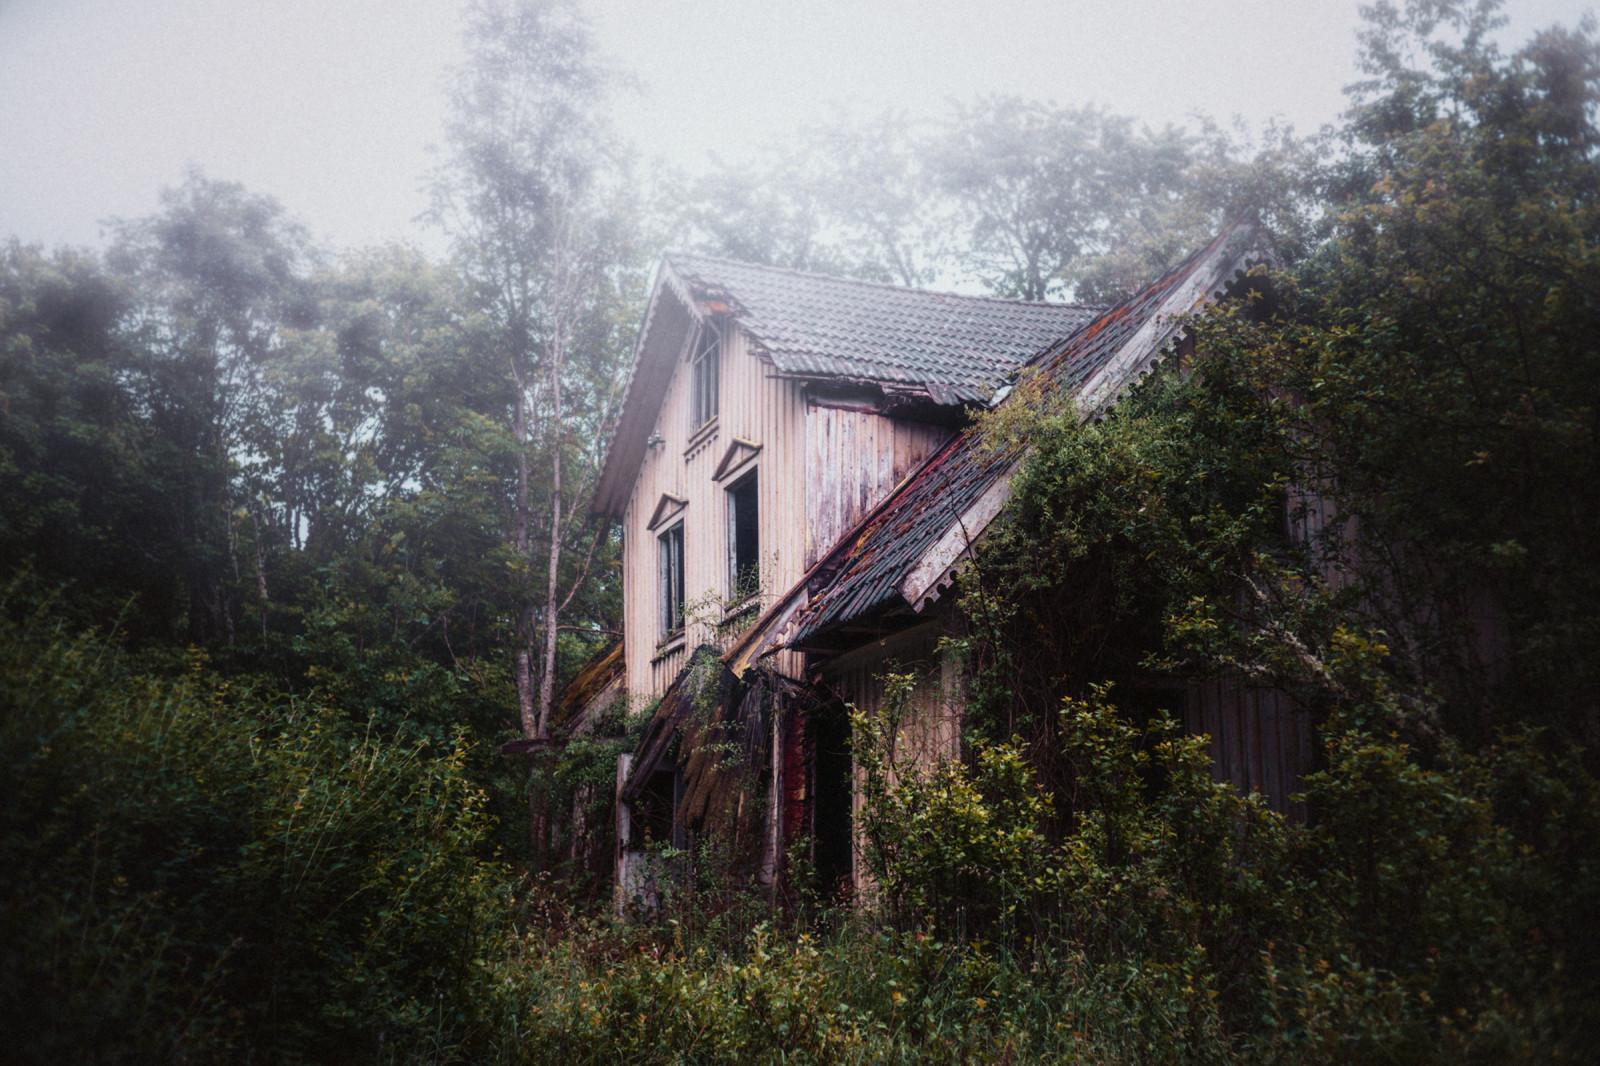 Couturie Forest Dehus_abandoned_abandonedhouse_fog_dimma_skog_forest_woods-848289